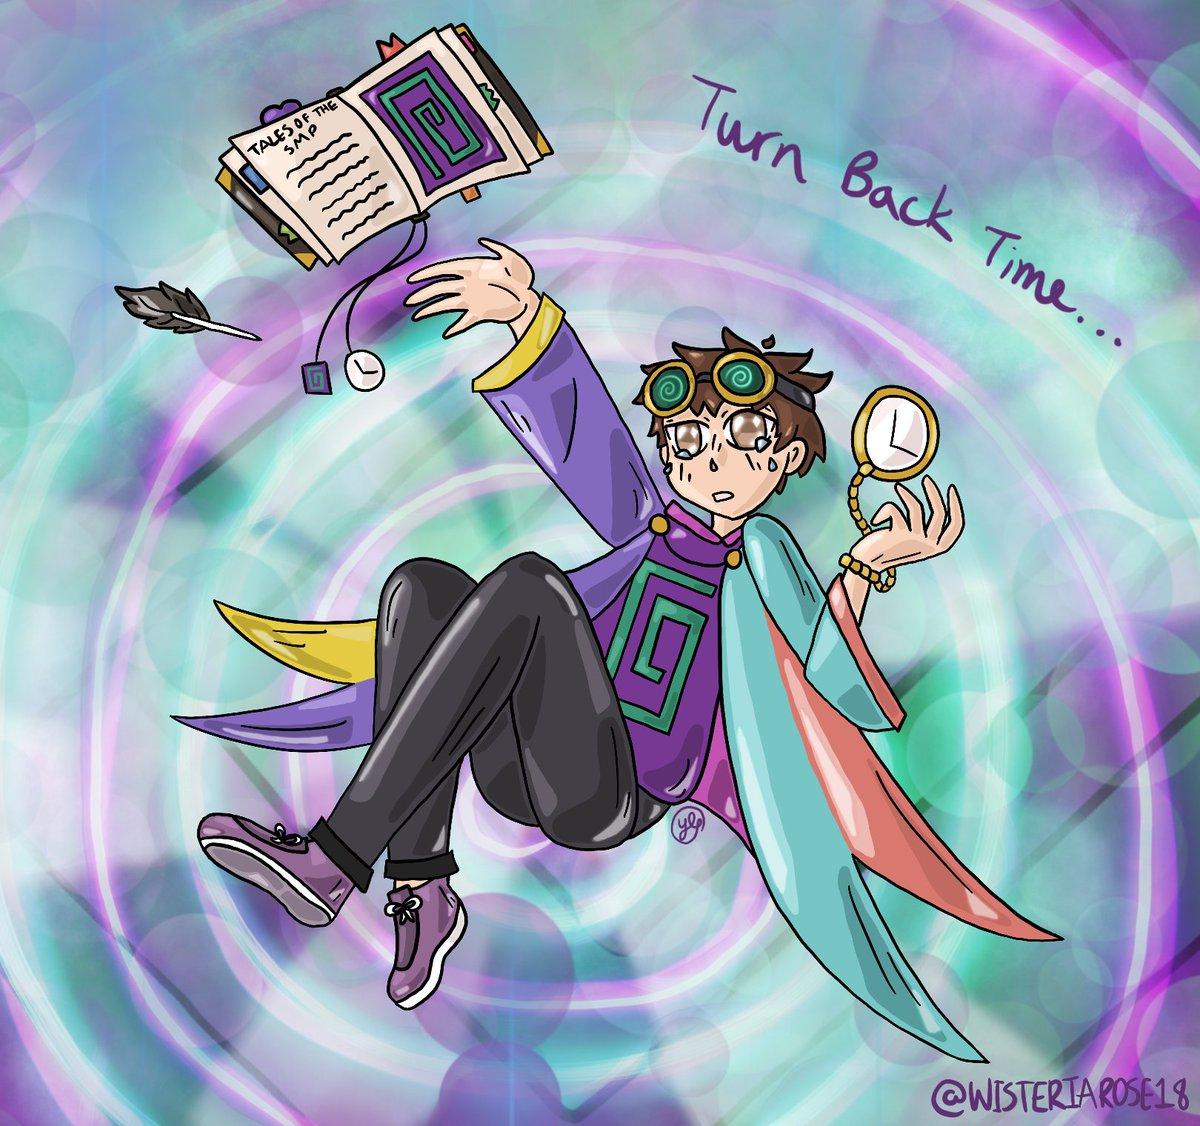 #karljacobsfanart #karlfanart #karljacobs #TalesFromTheSMP #talesofthesmp #TALESFROMTHESMPfanart #TalesfromtheSMPArt   Karl Time Traveling!